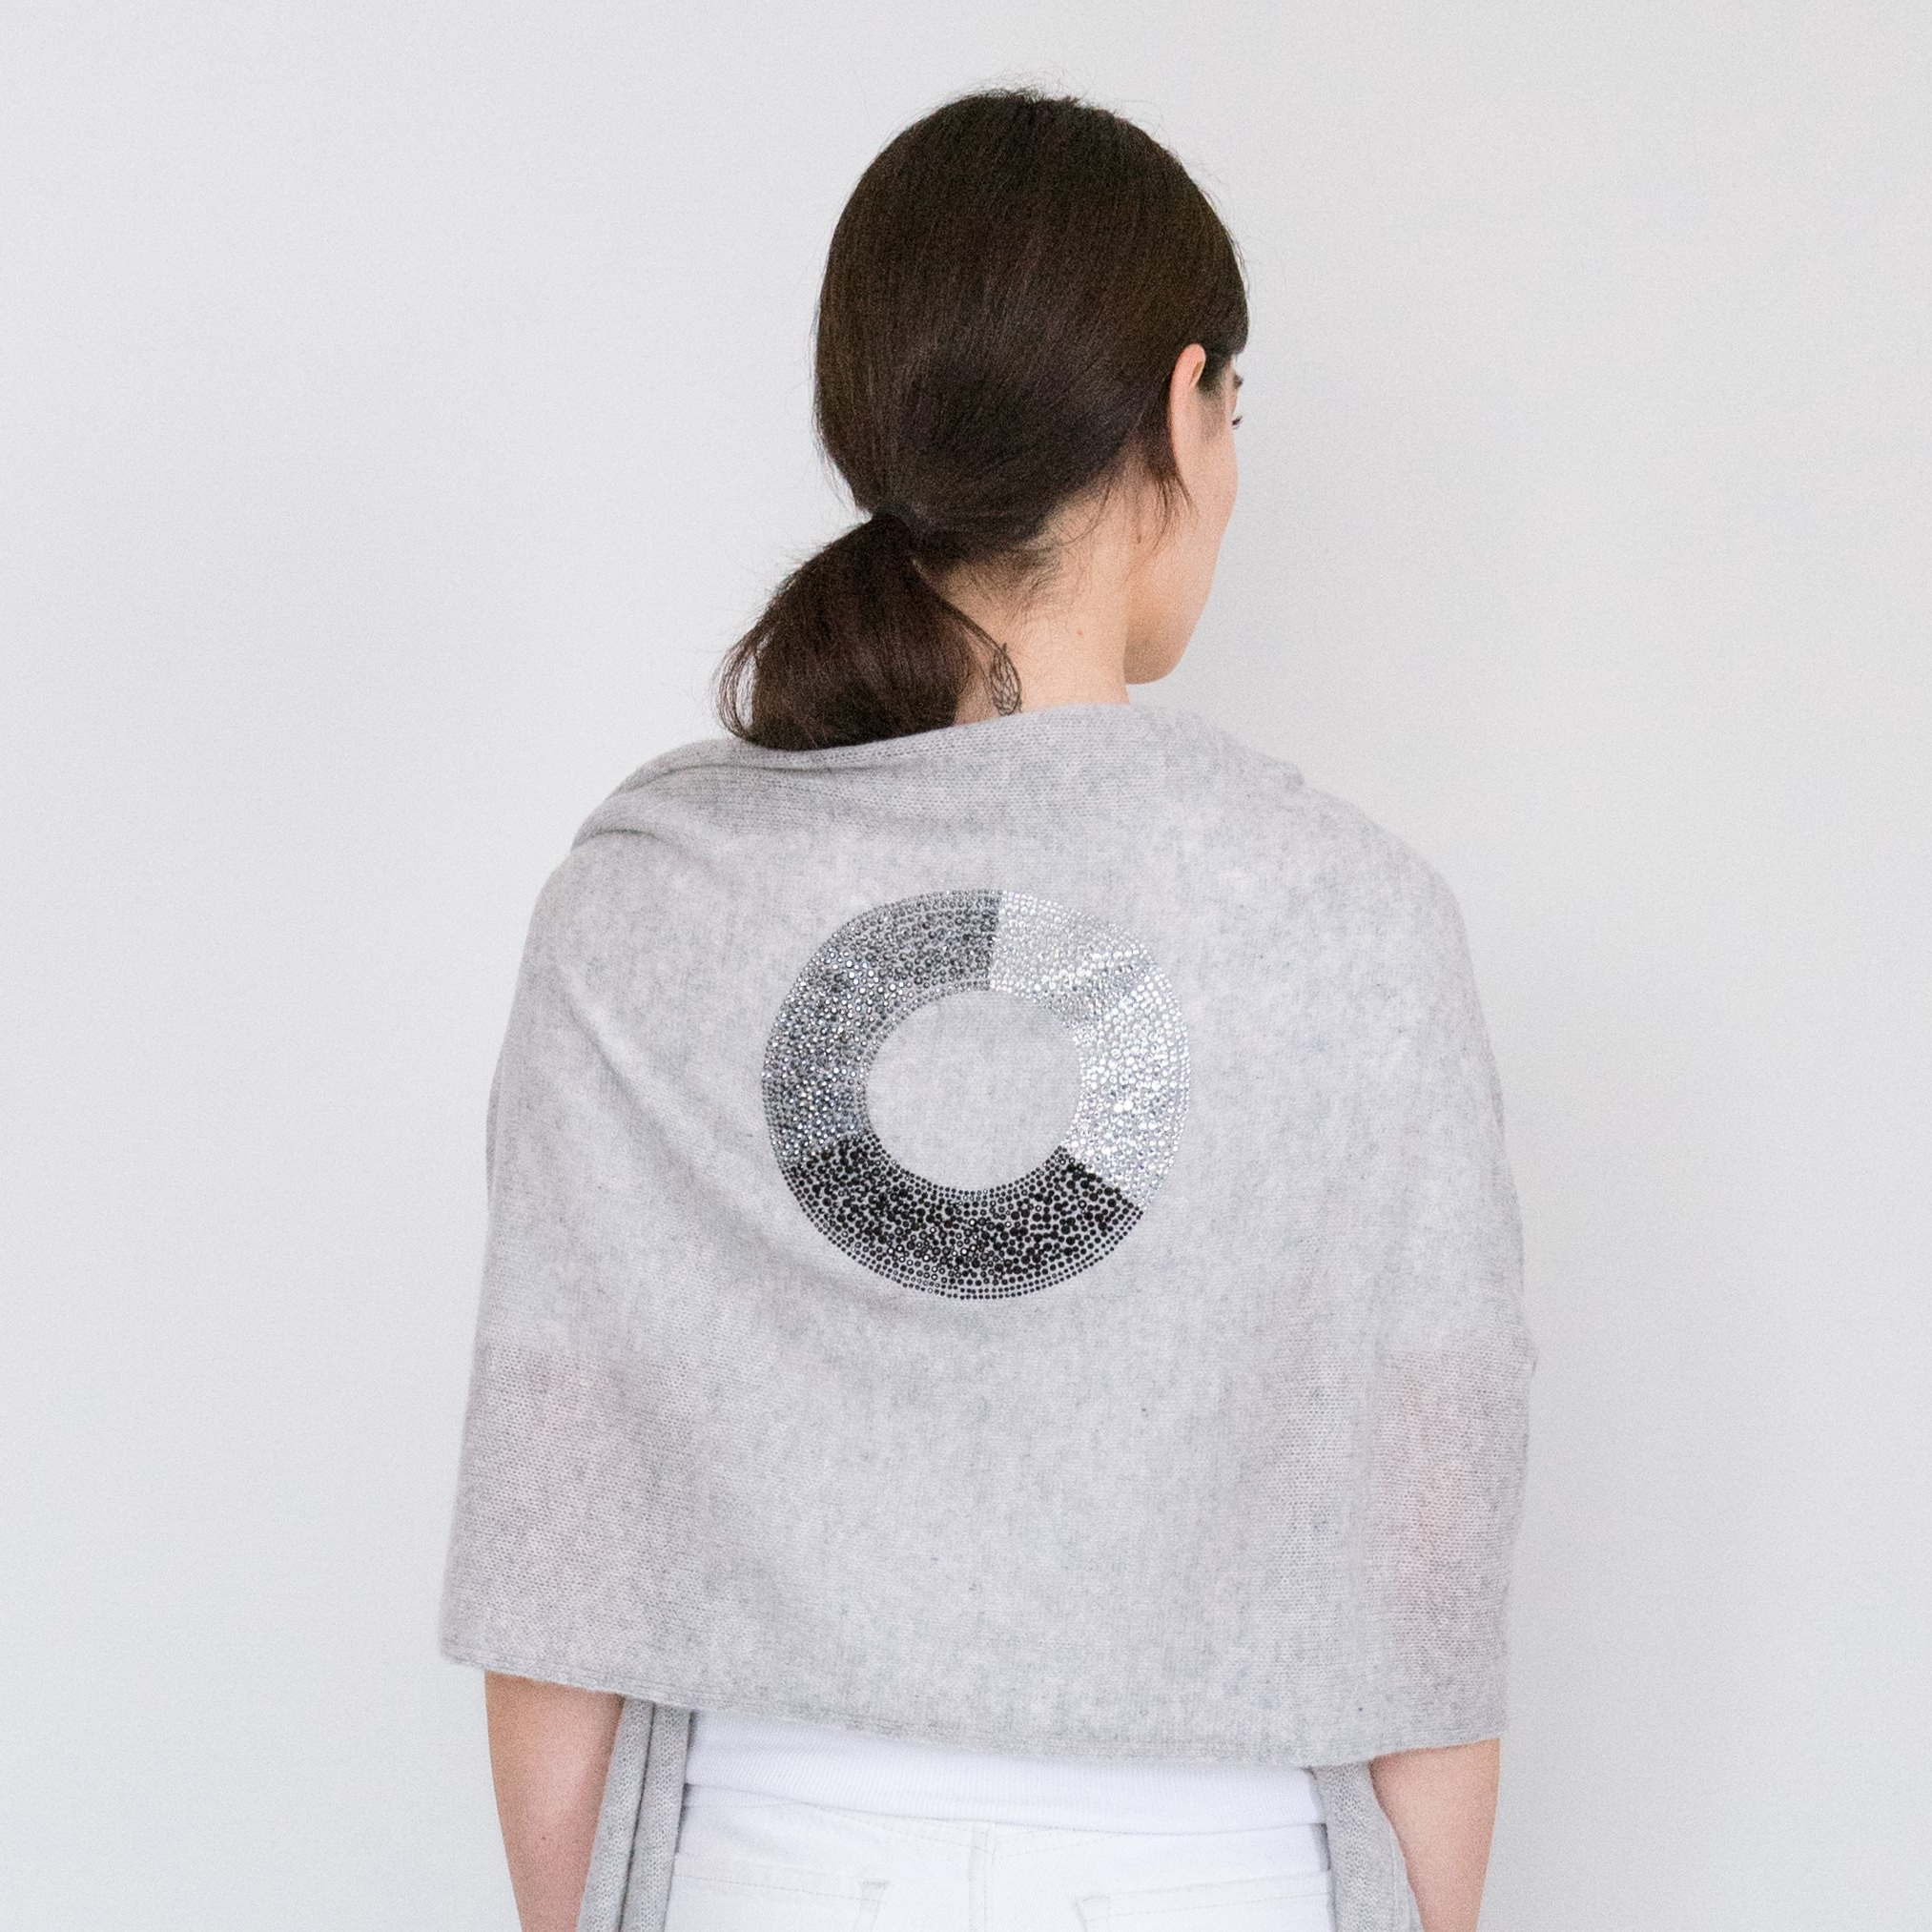 - 3-Color Ring Black Crystal on Light Heather Grey Cashmere